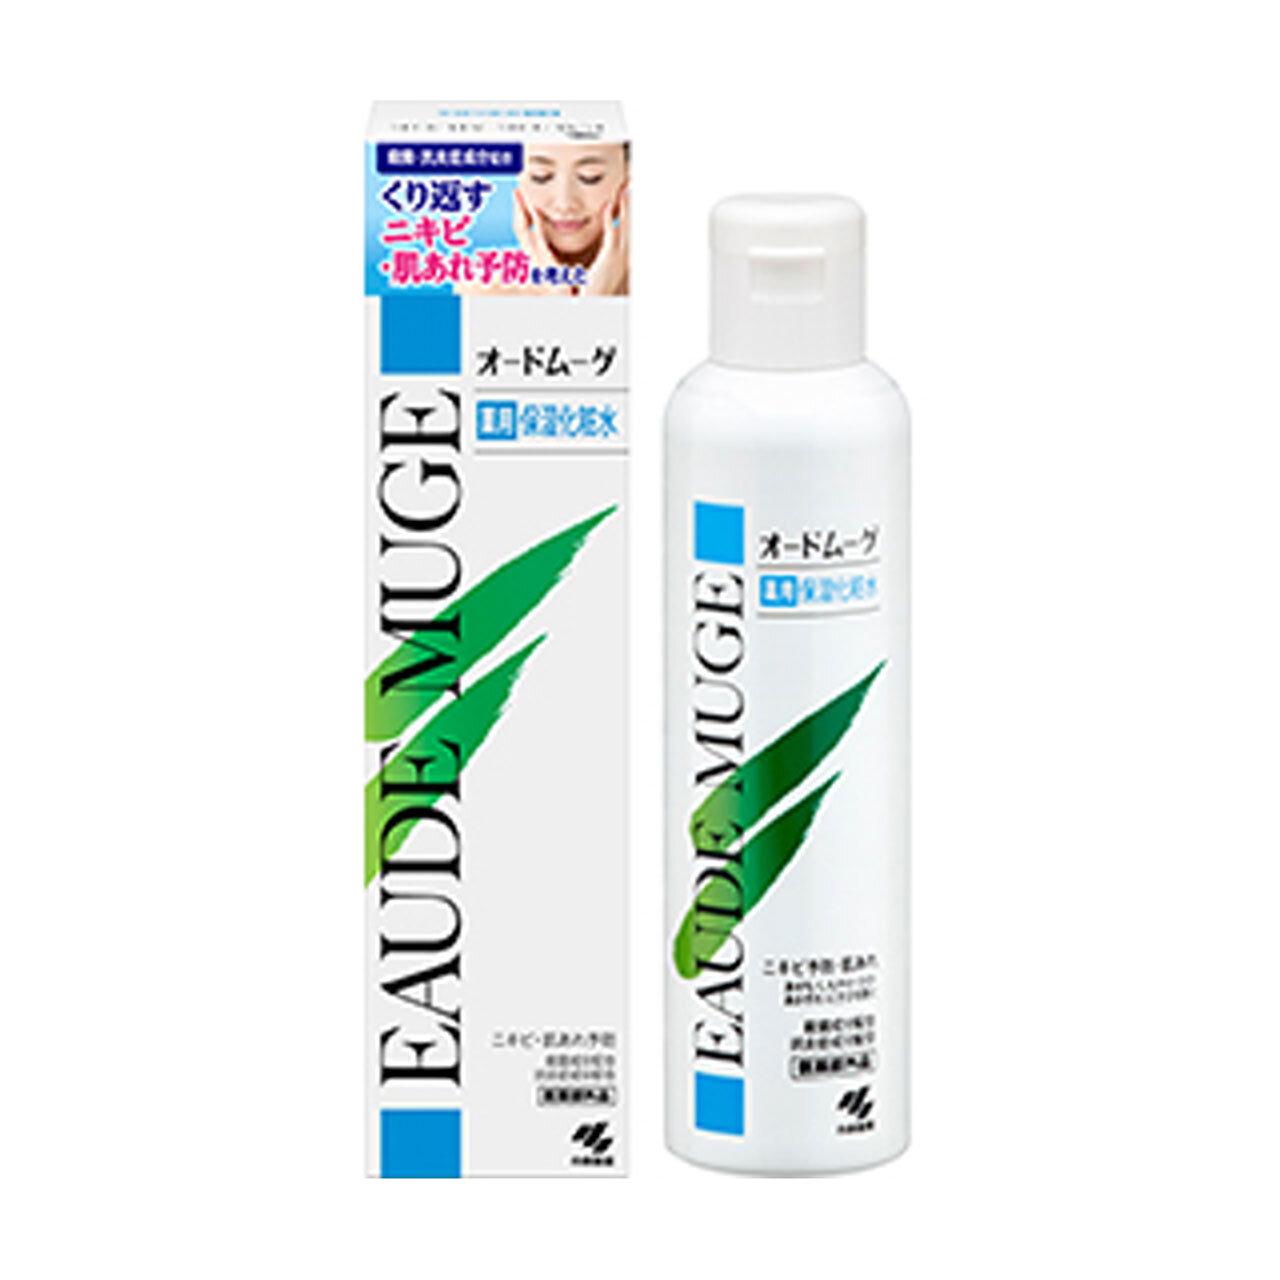 《小林製薬》オードムーゲ 薬用保湿化粧水